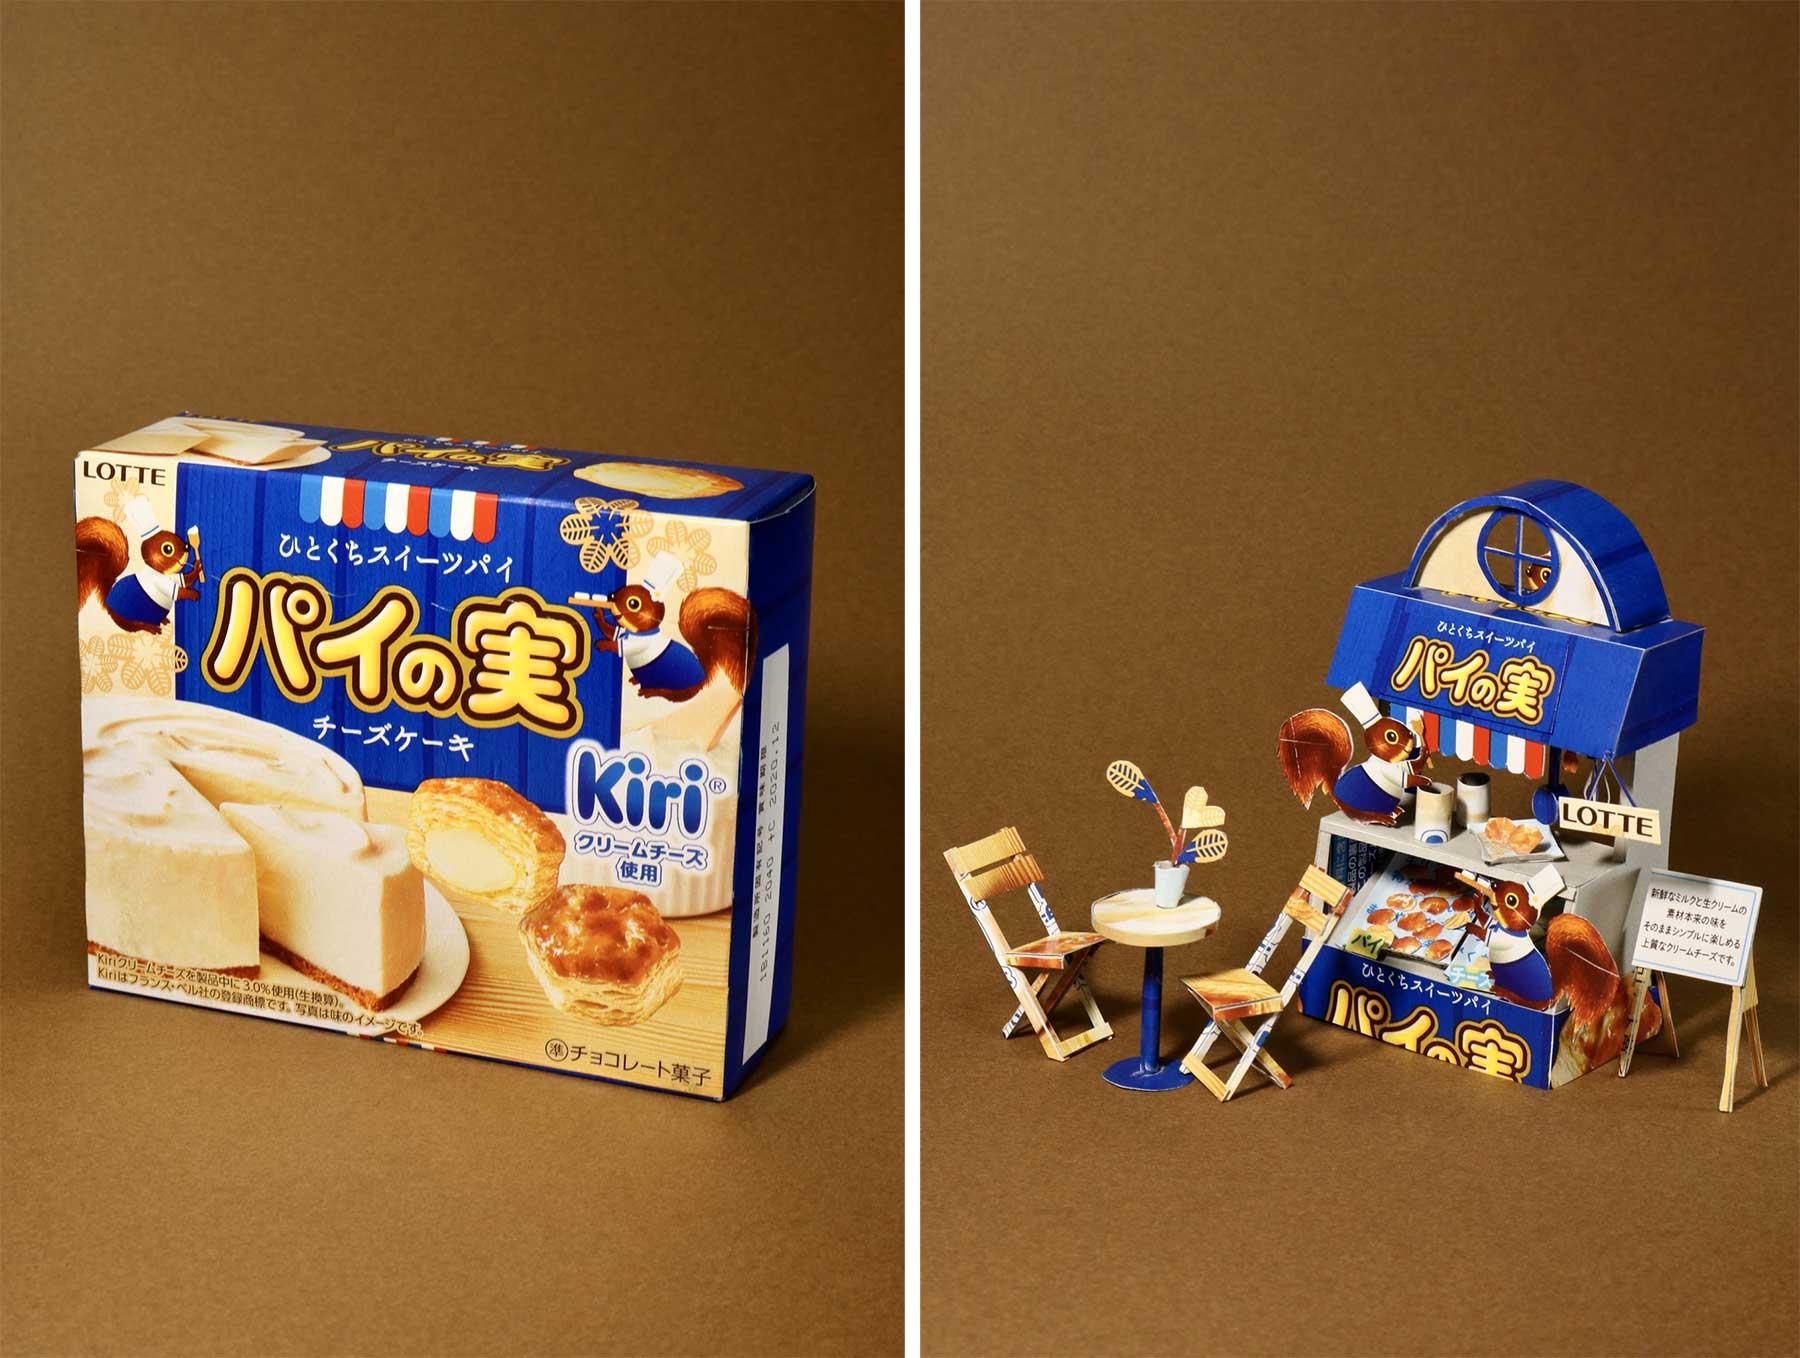 Neue Verpackungs-Skulpturen von Haruki verpackungsskulpturen-haruki-2020_04